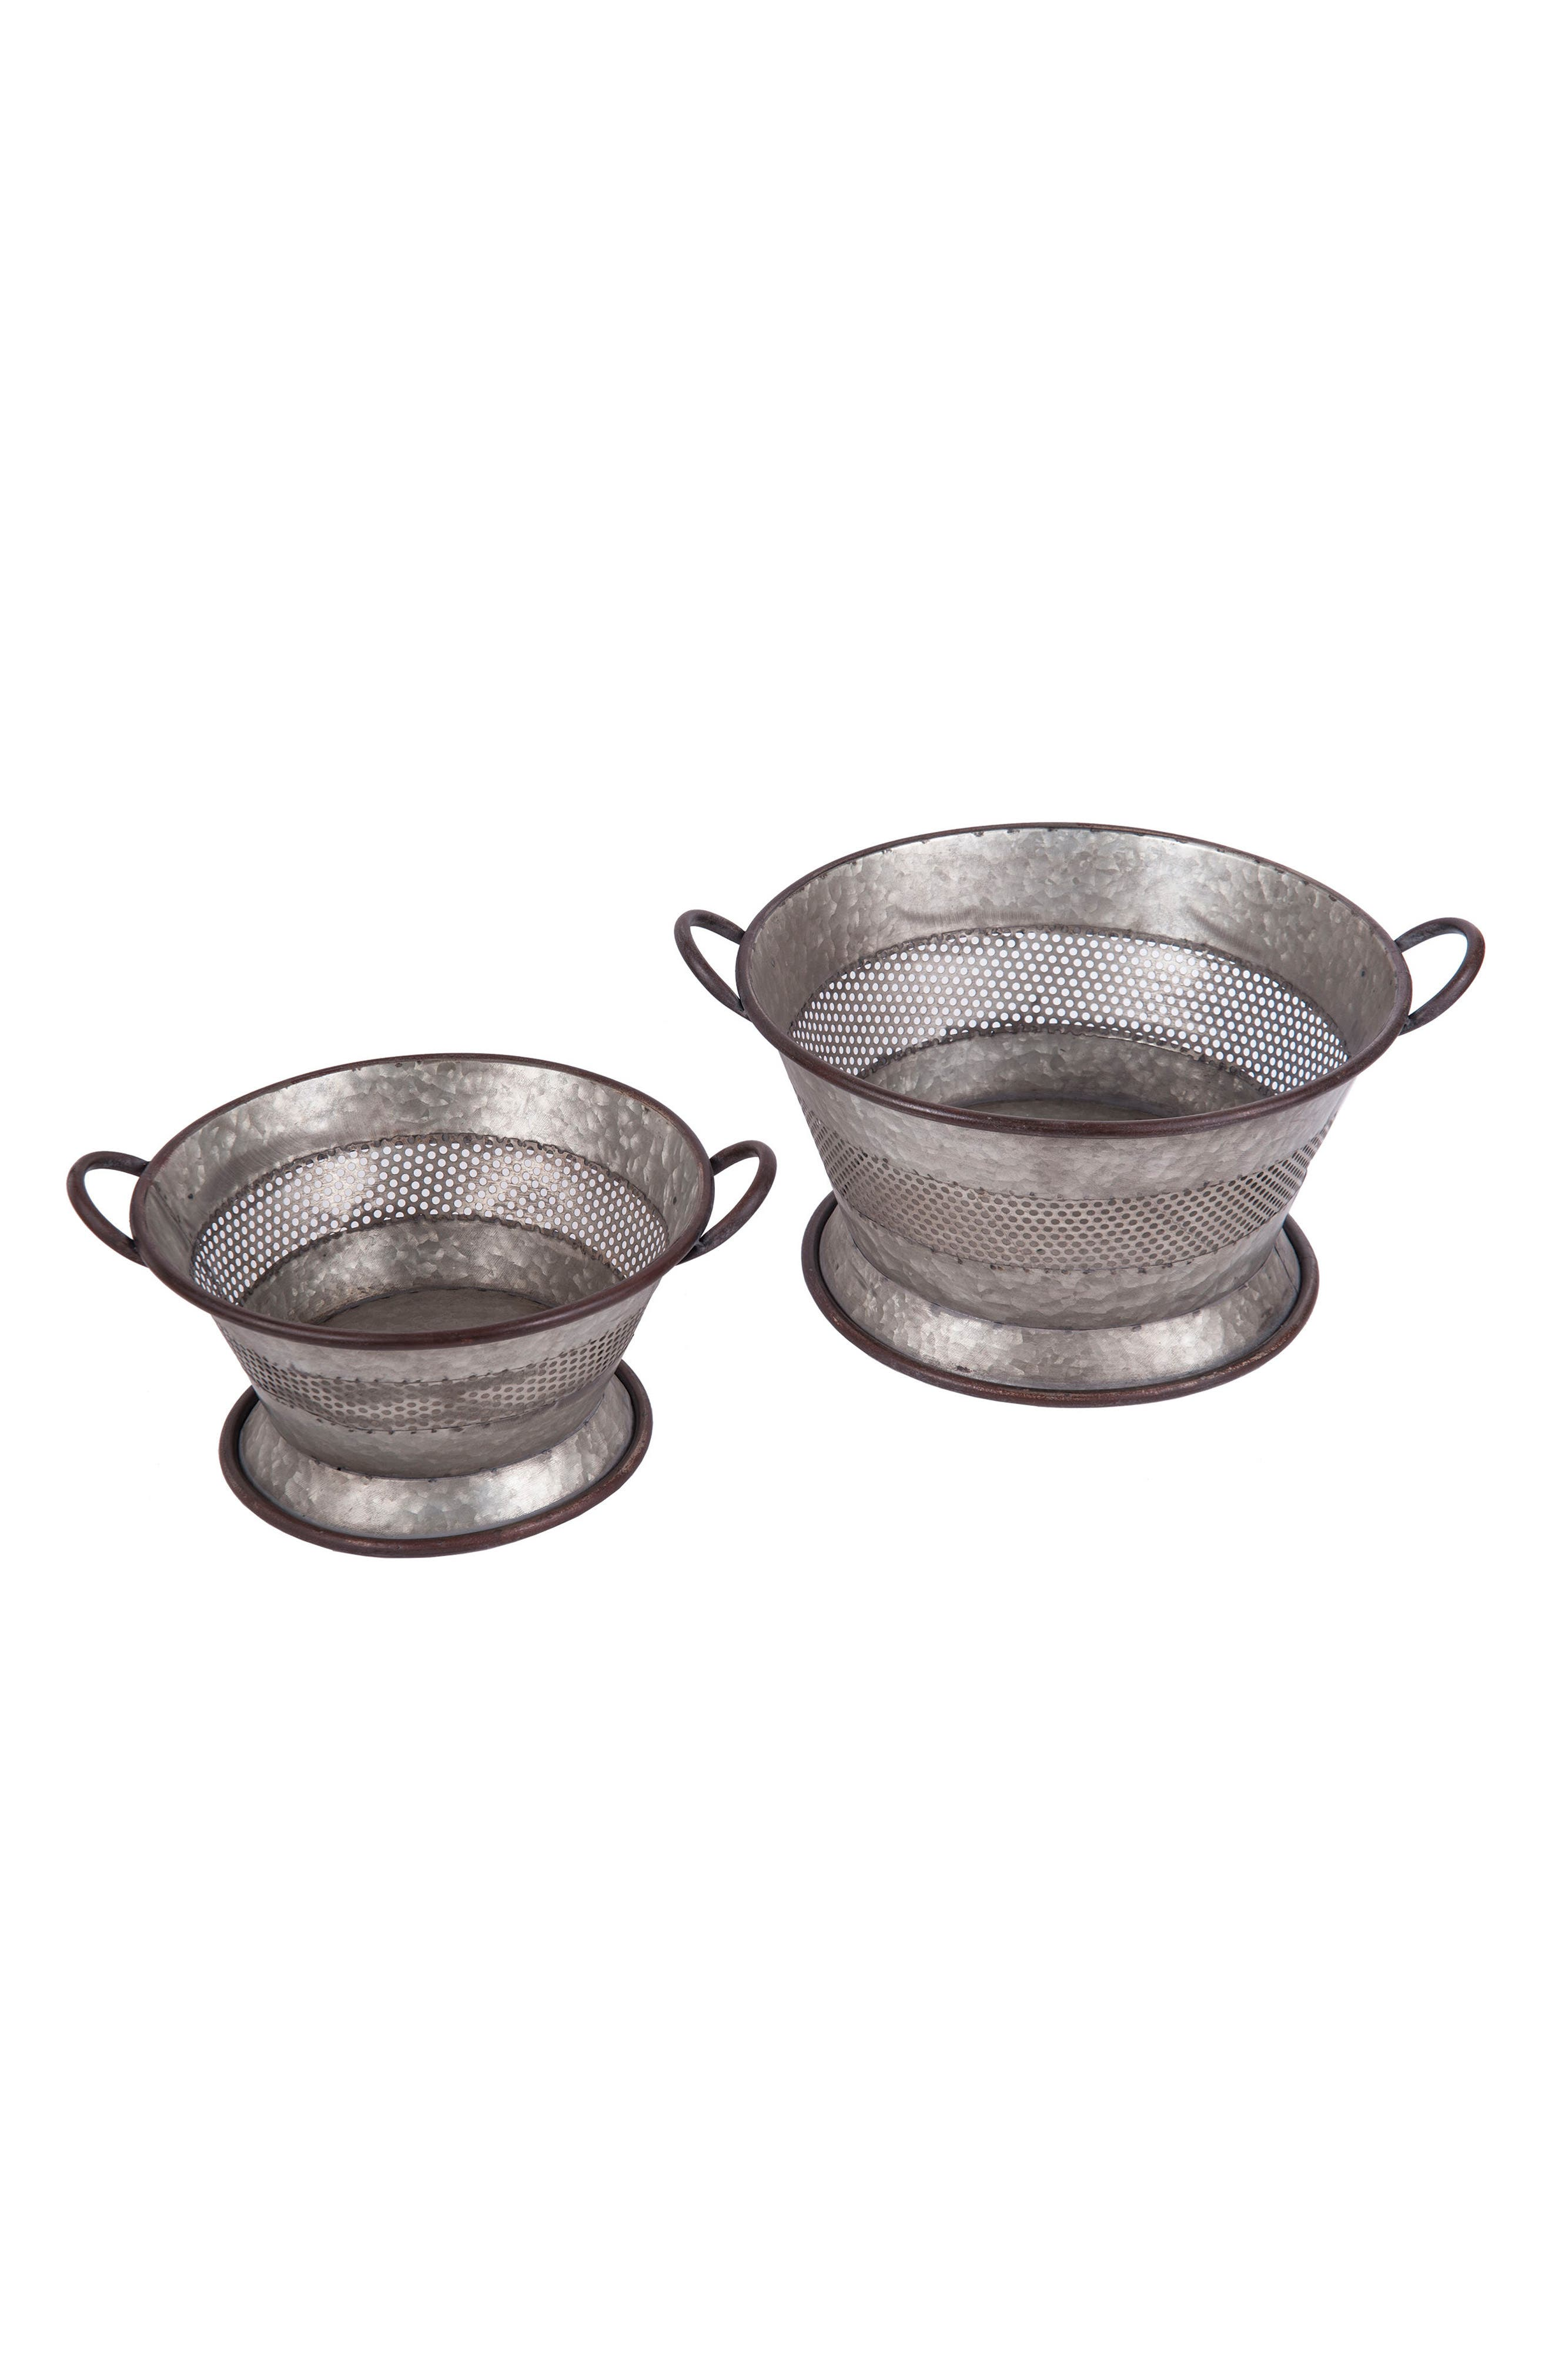 Set of 2 Decorative Strainer Baskets,                             Main thumbnail 1, color,                             040